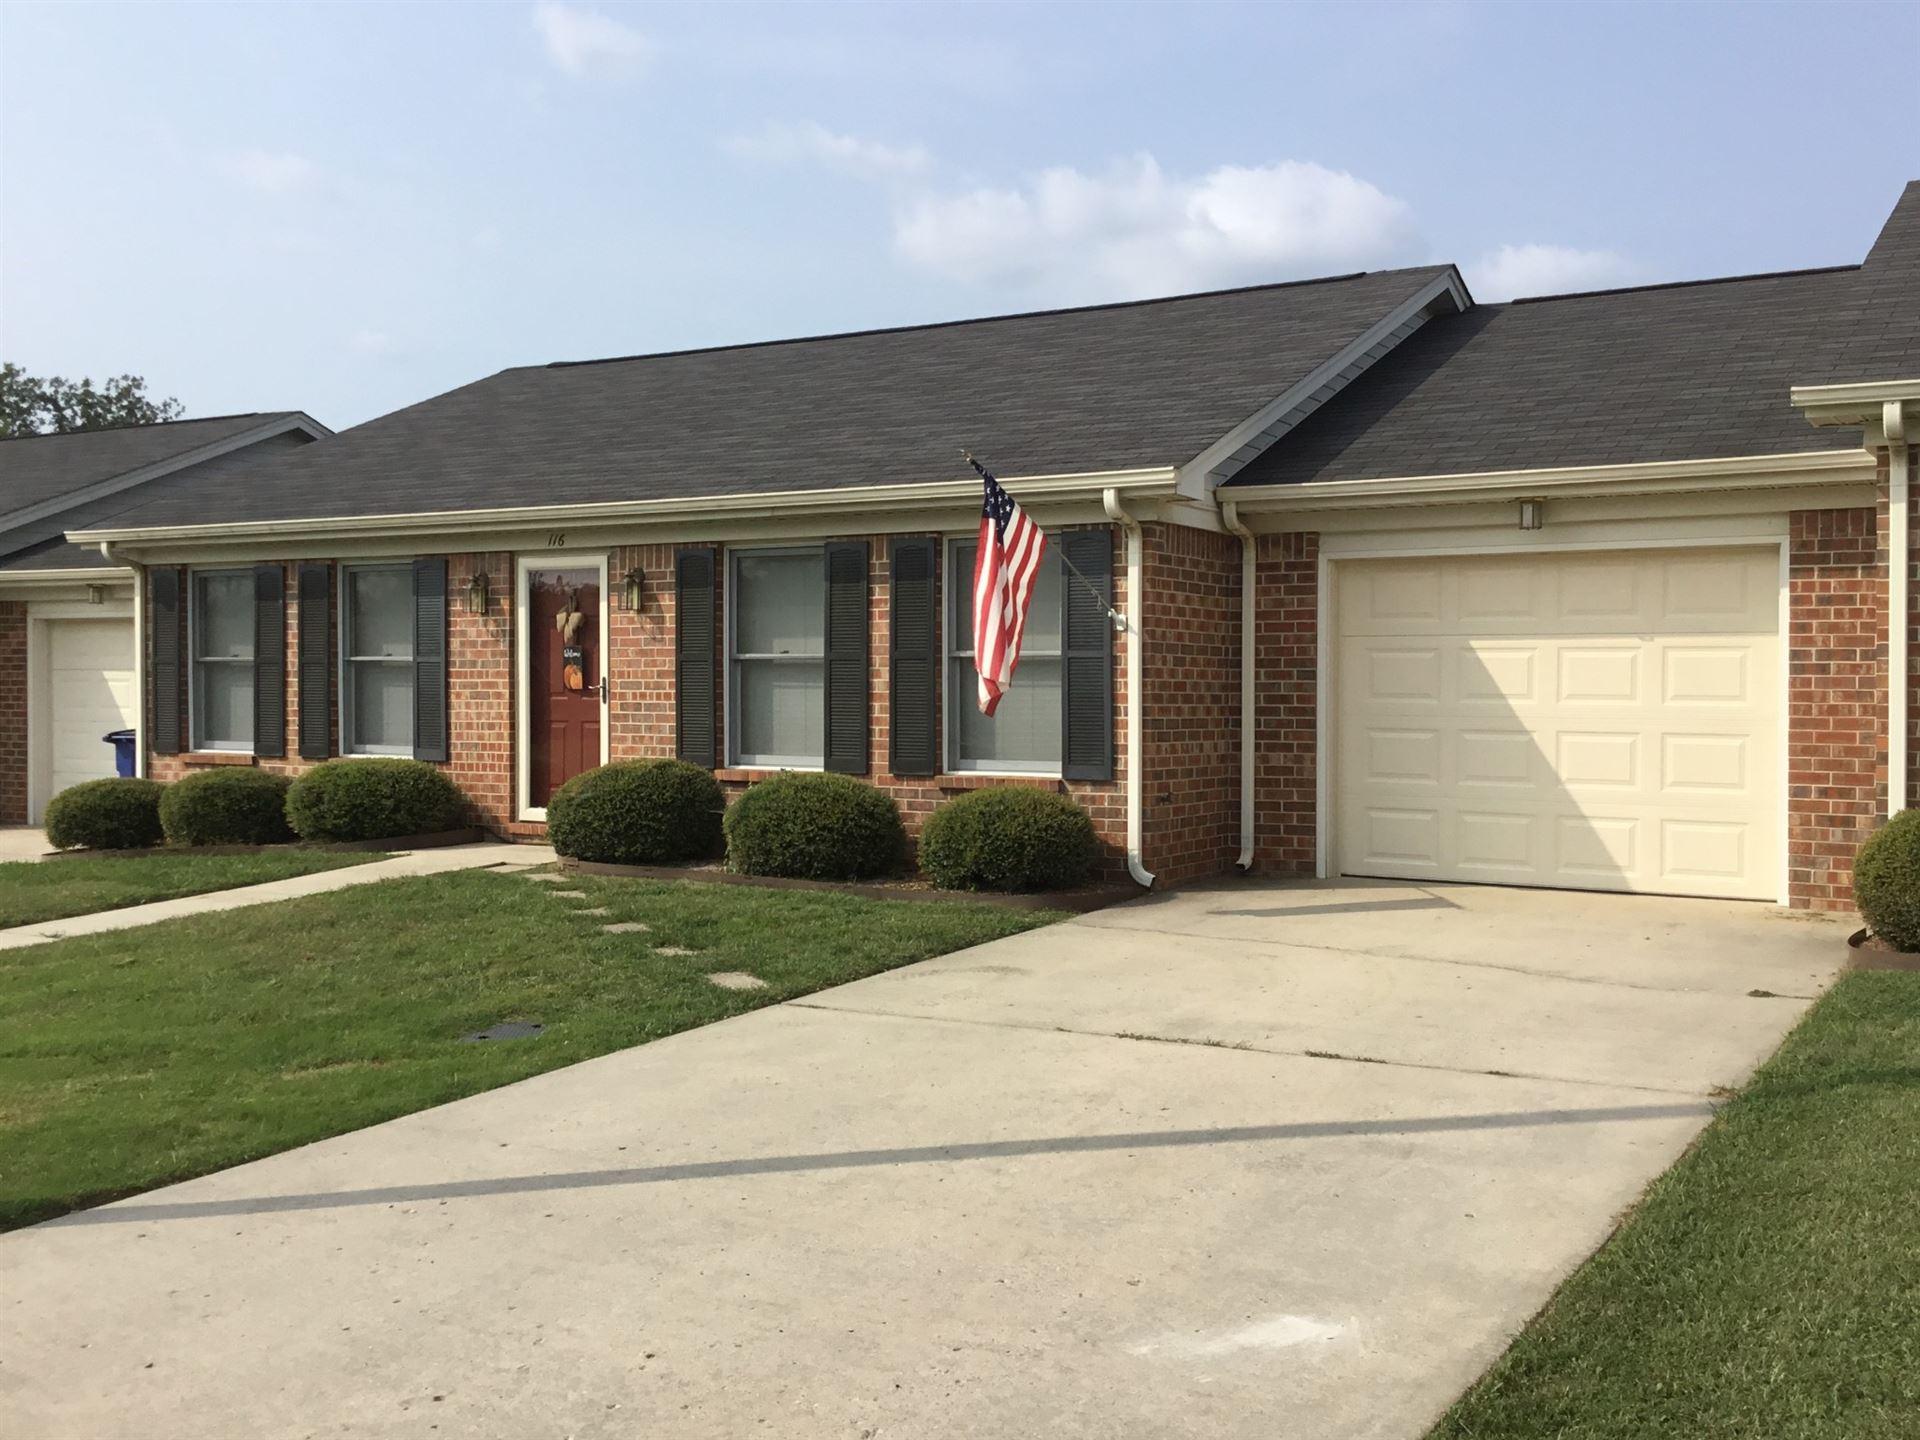 116 Dogwood Ct, Shelbyville, TN 37160 - MLS#: 2190874